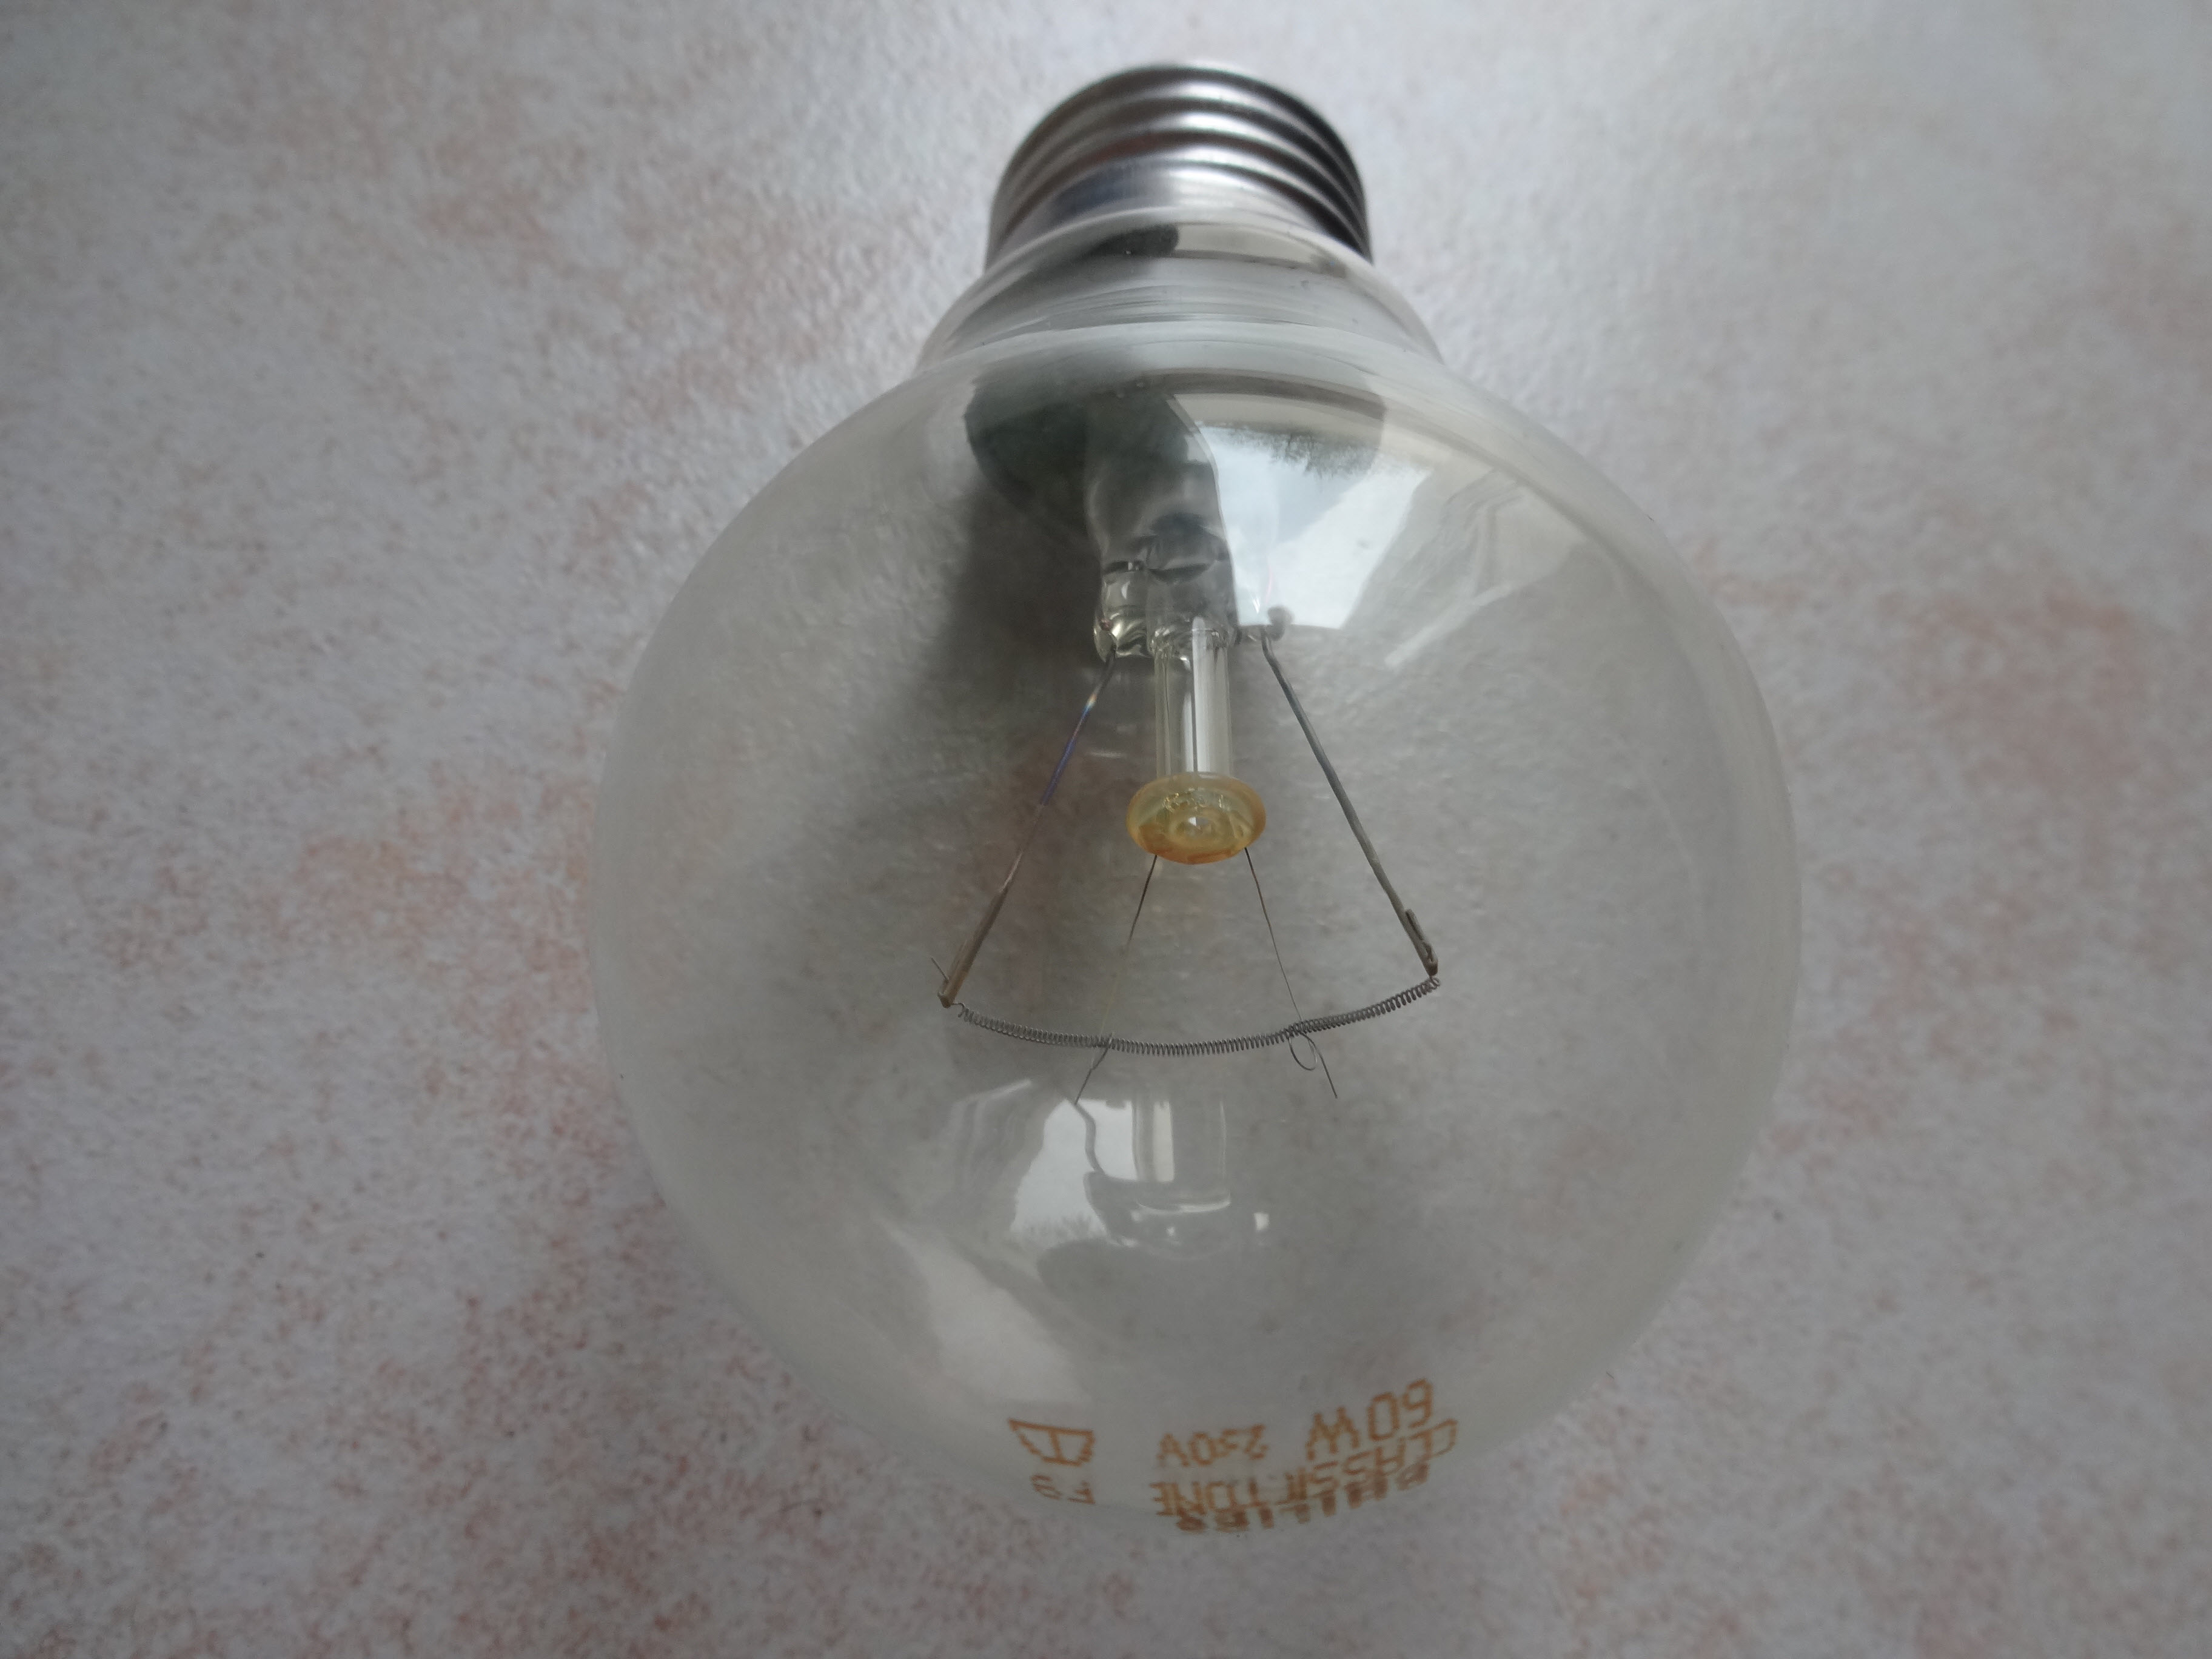 & Low EMF Lighting - My Recommendations   ElectricSense